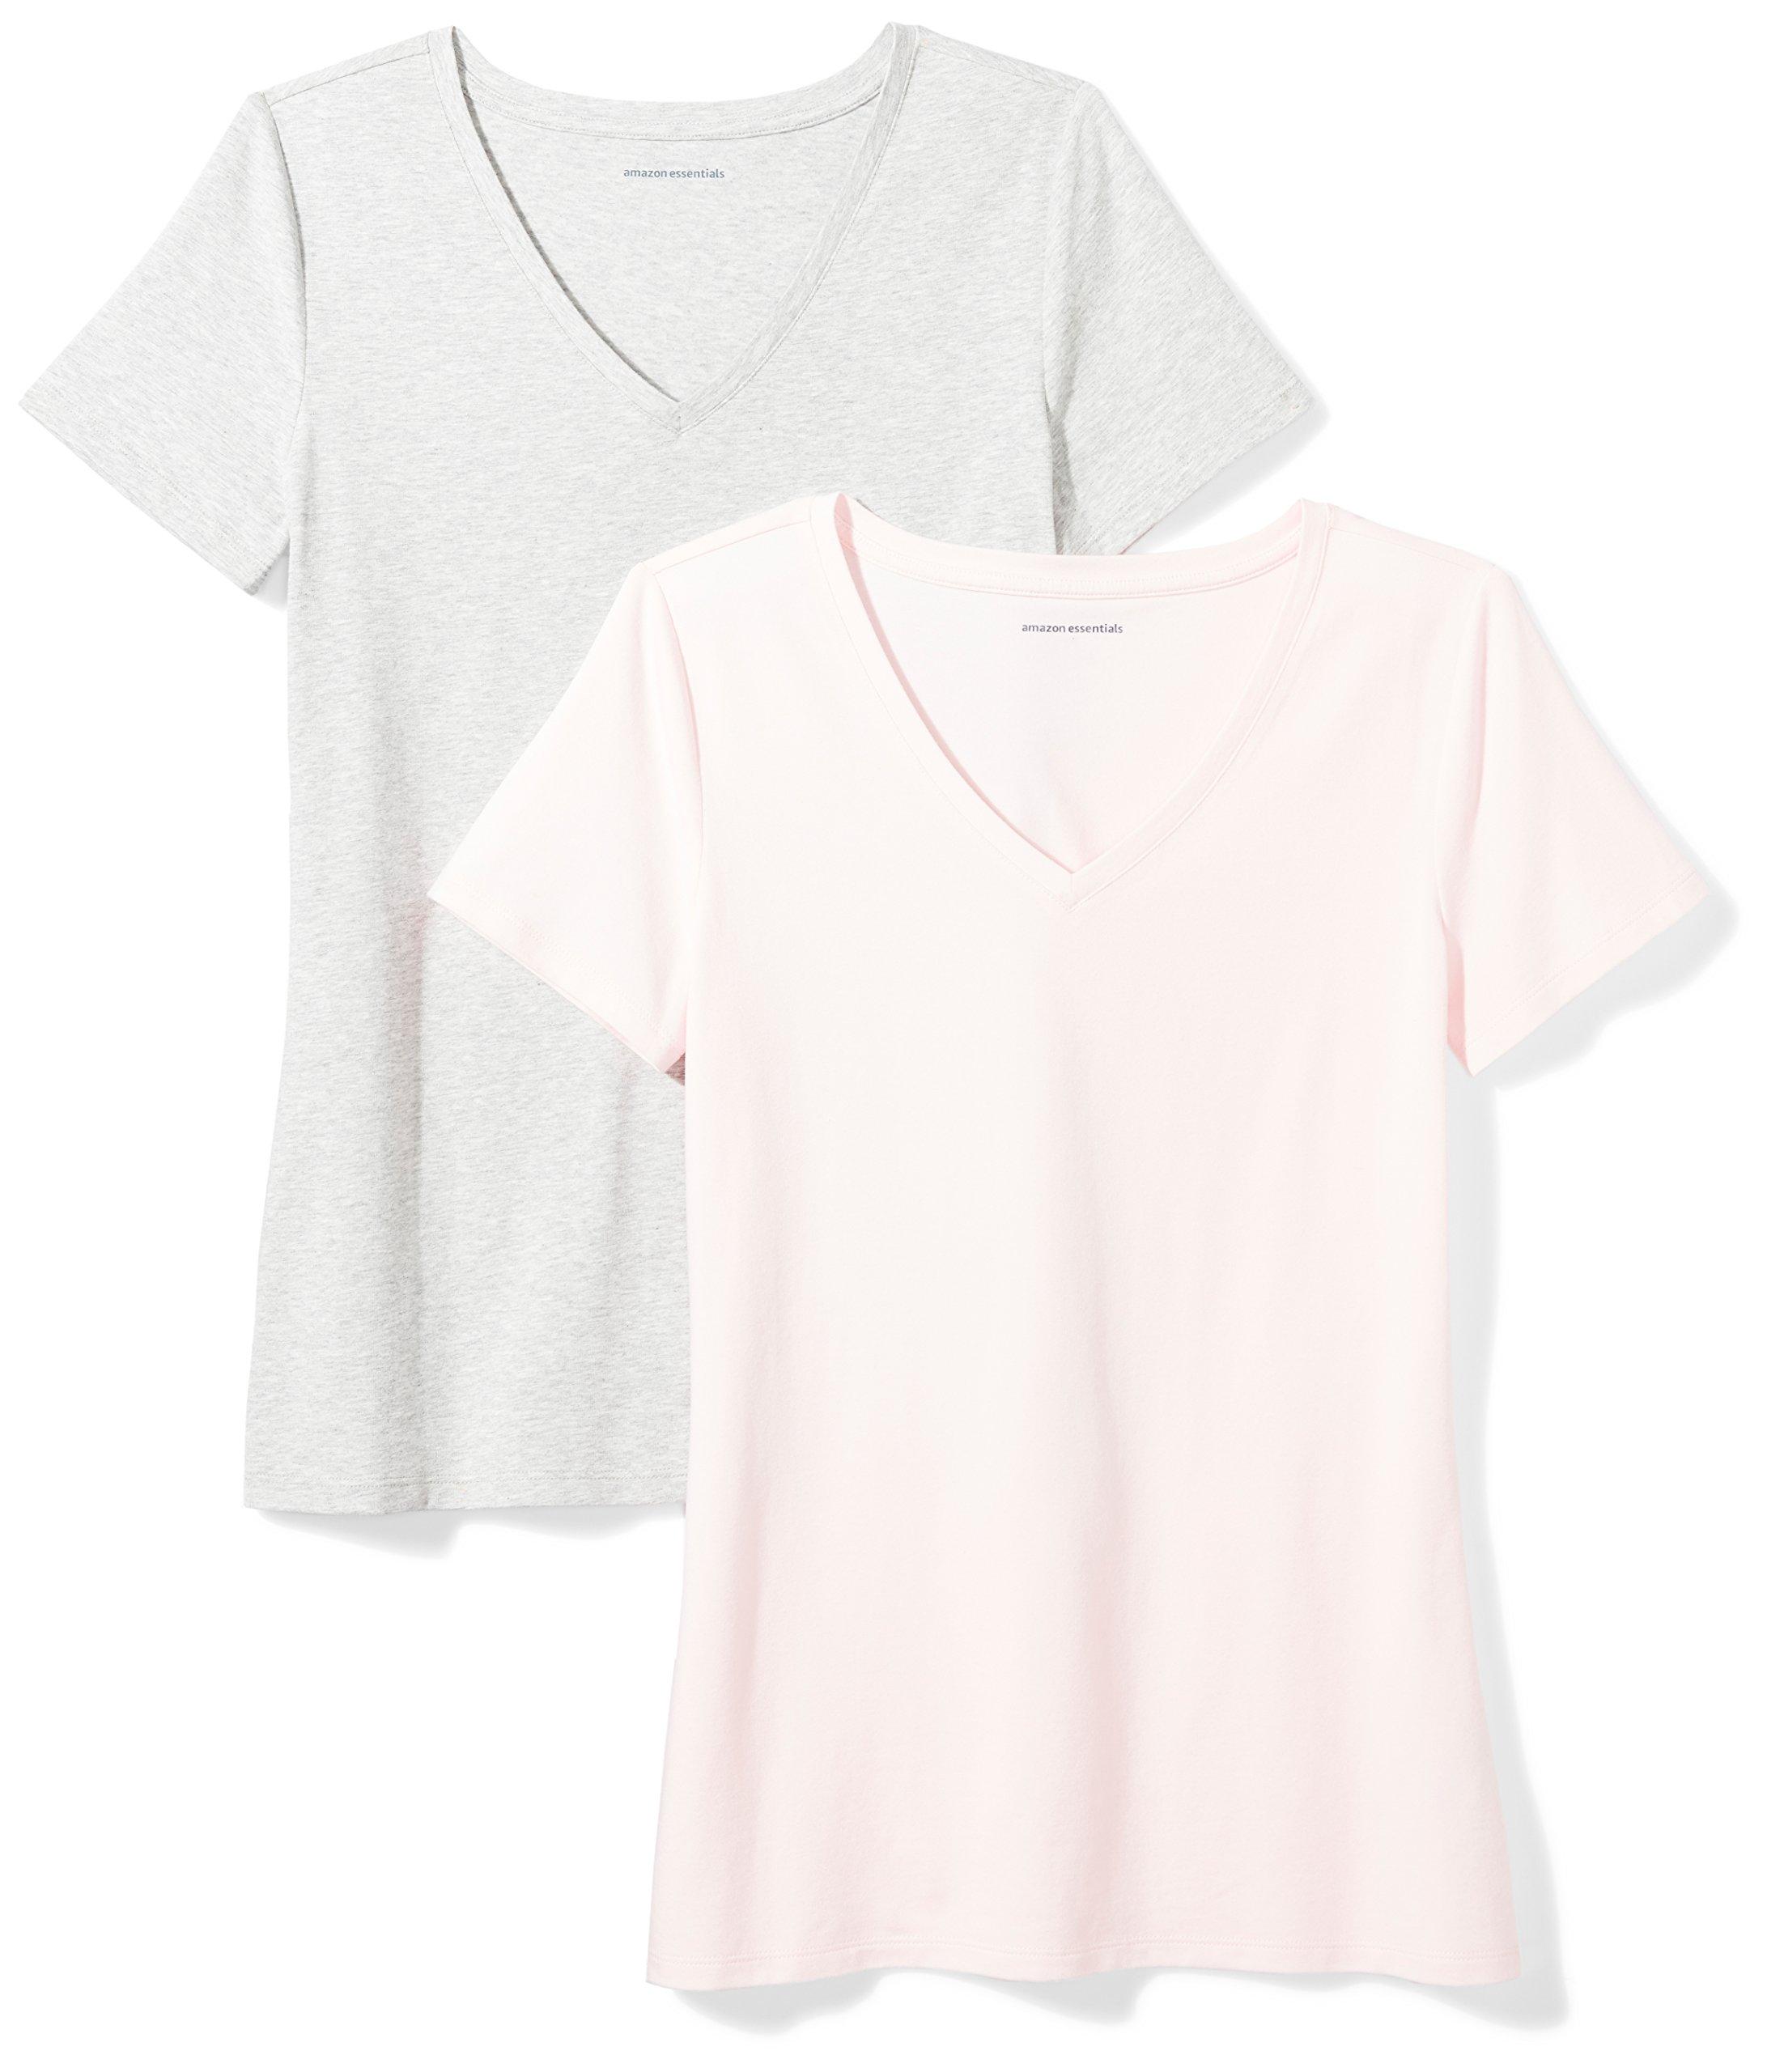 Amazon Essentials Women's 2-Pack Short-Sleeve V-Neck Solid T-Shirt, Light Pink/Light Grey Heather, X-Large